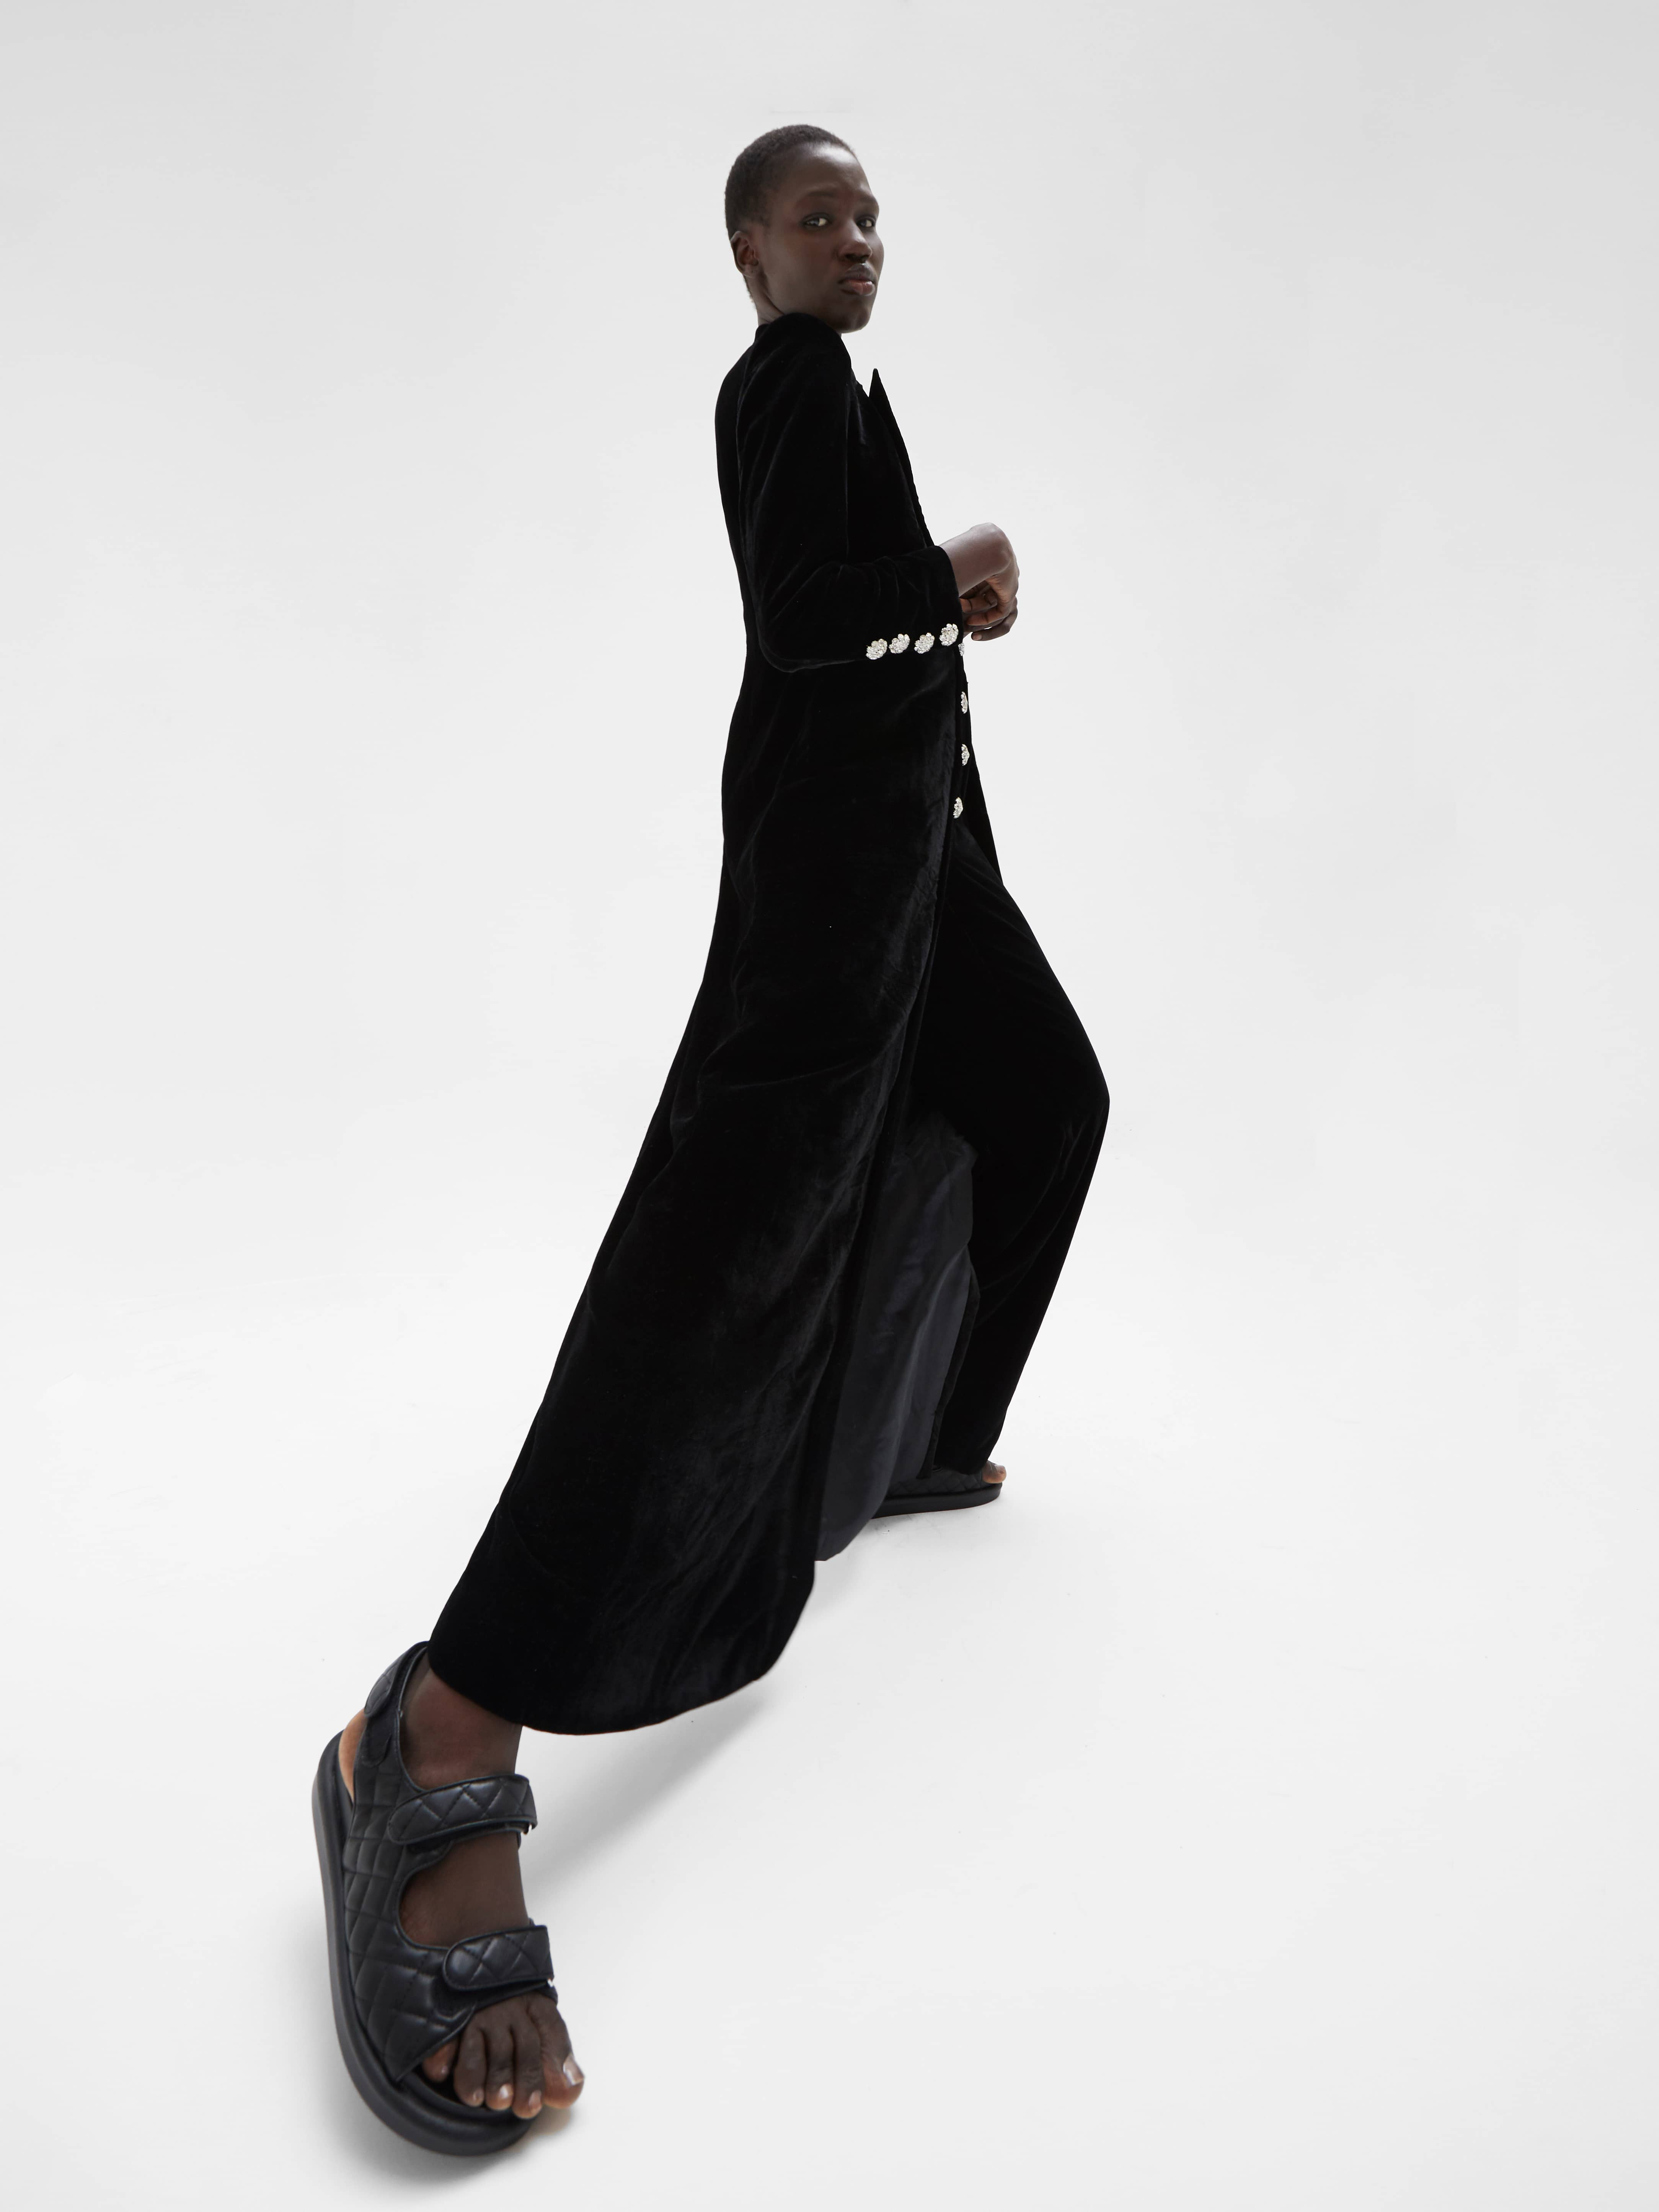 View 4 of model wearing Kezia Kimono in black.